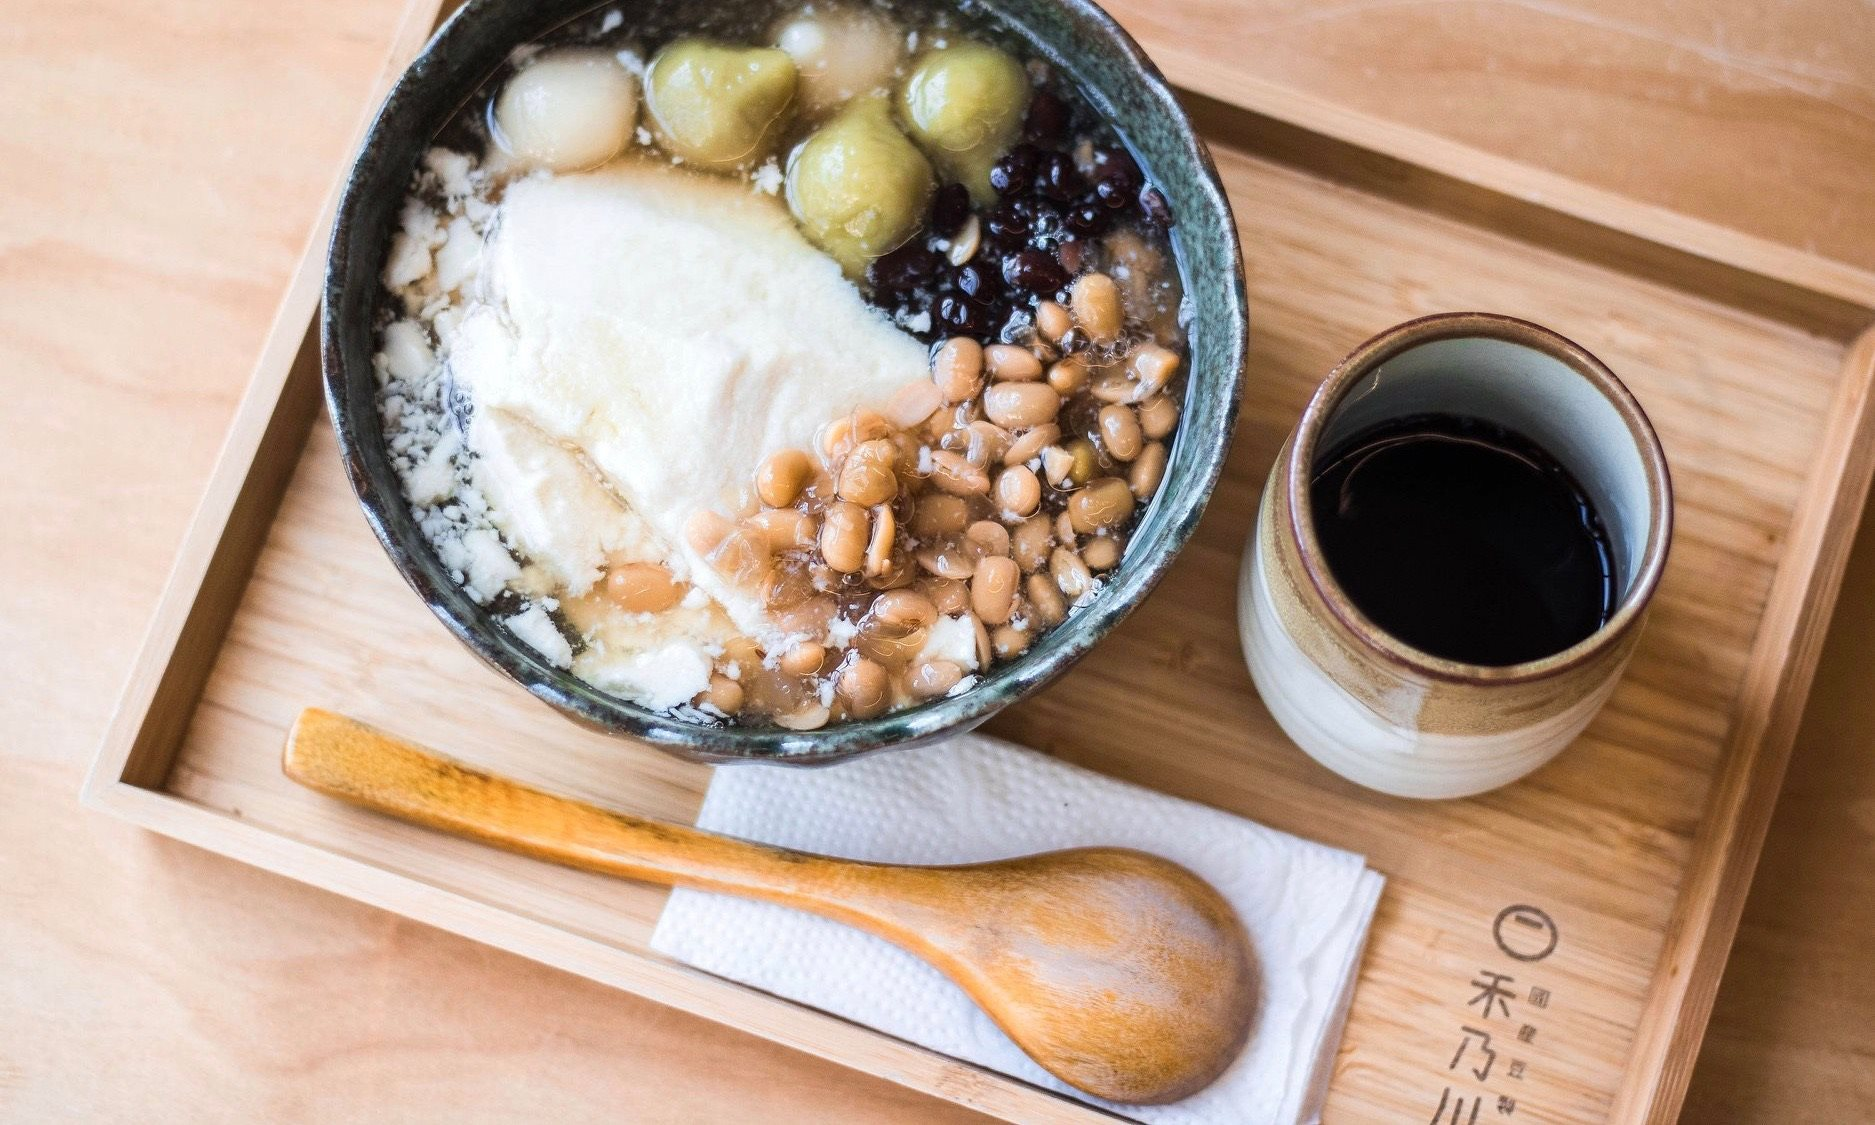 HIDEKAWA Domestic Soybeans Products - Taipei best soy milk shop